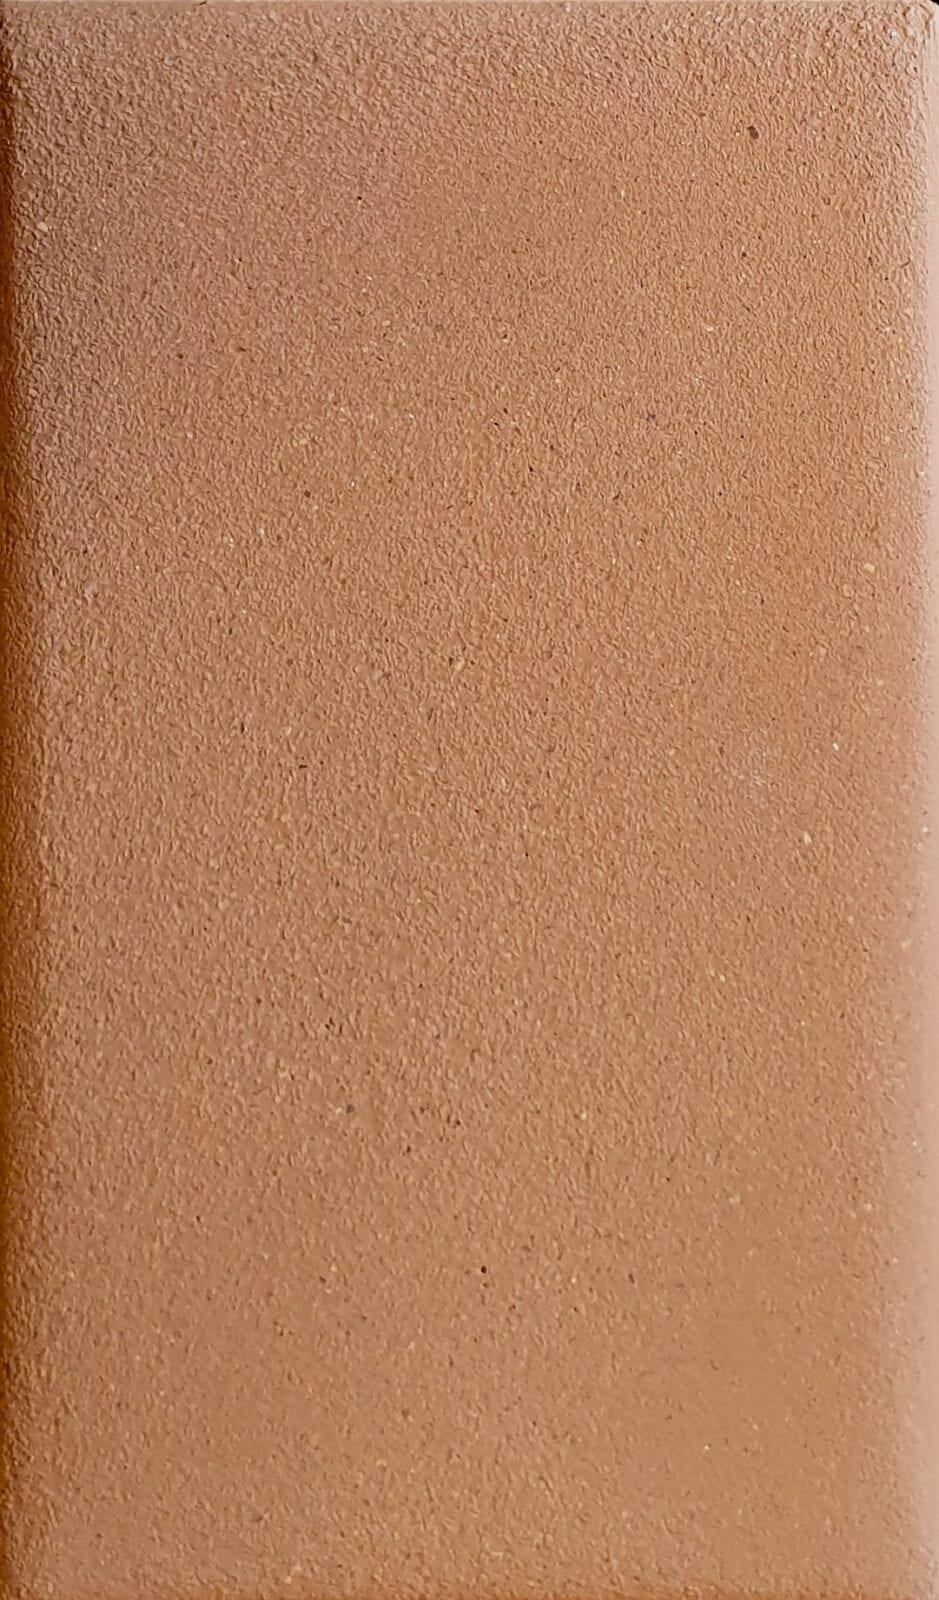 Ayers Finish 33% kleurleem leemstuc